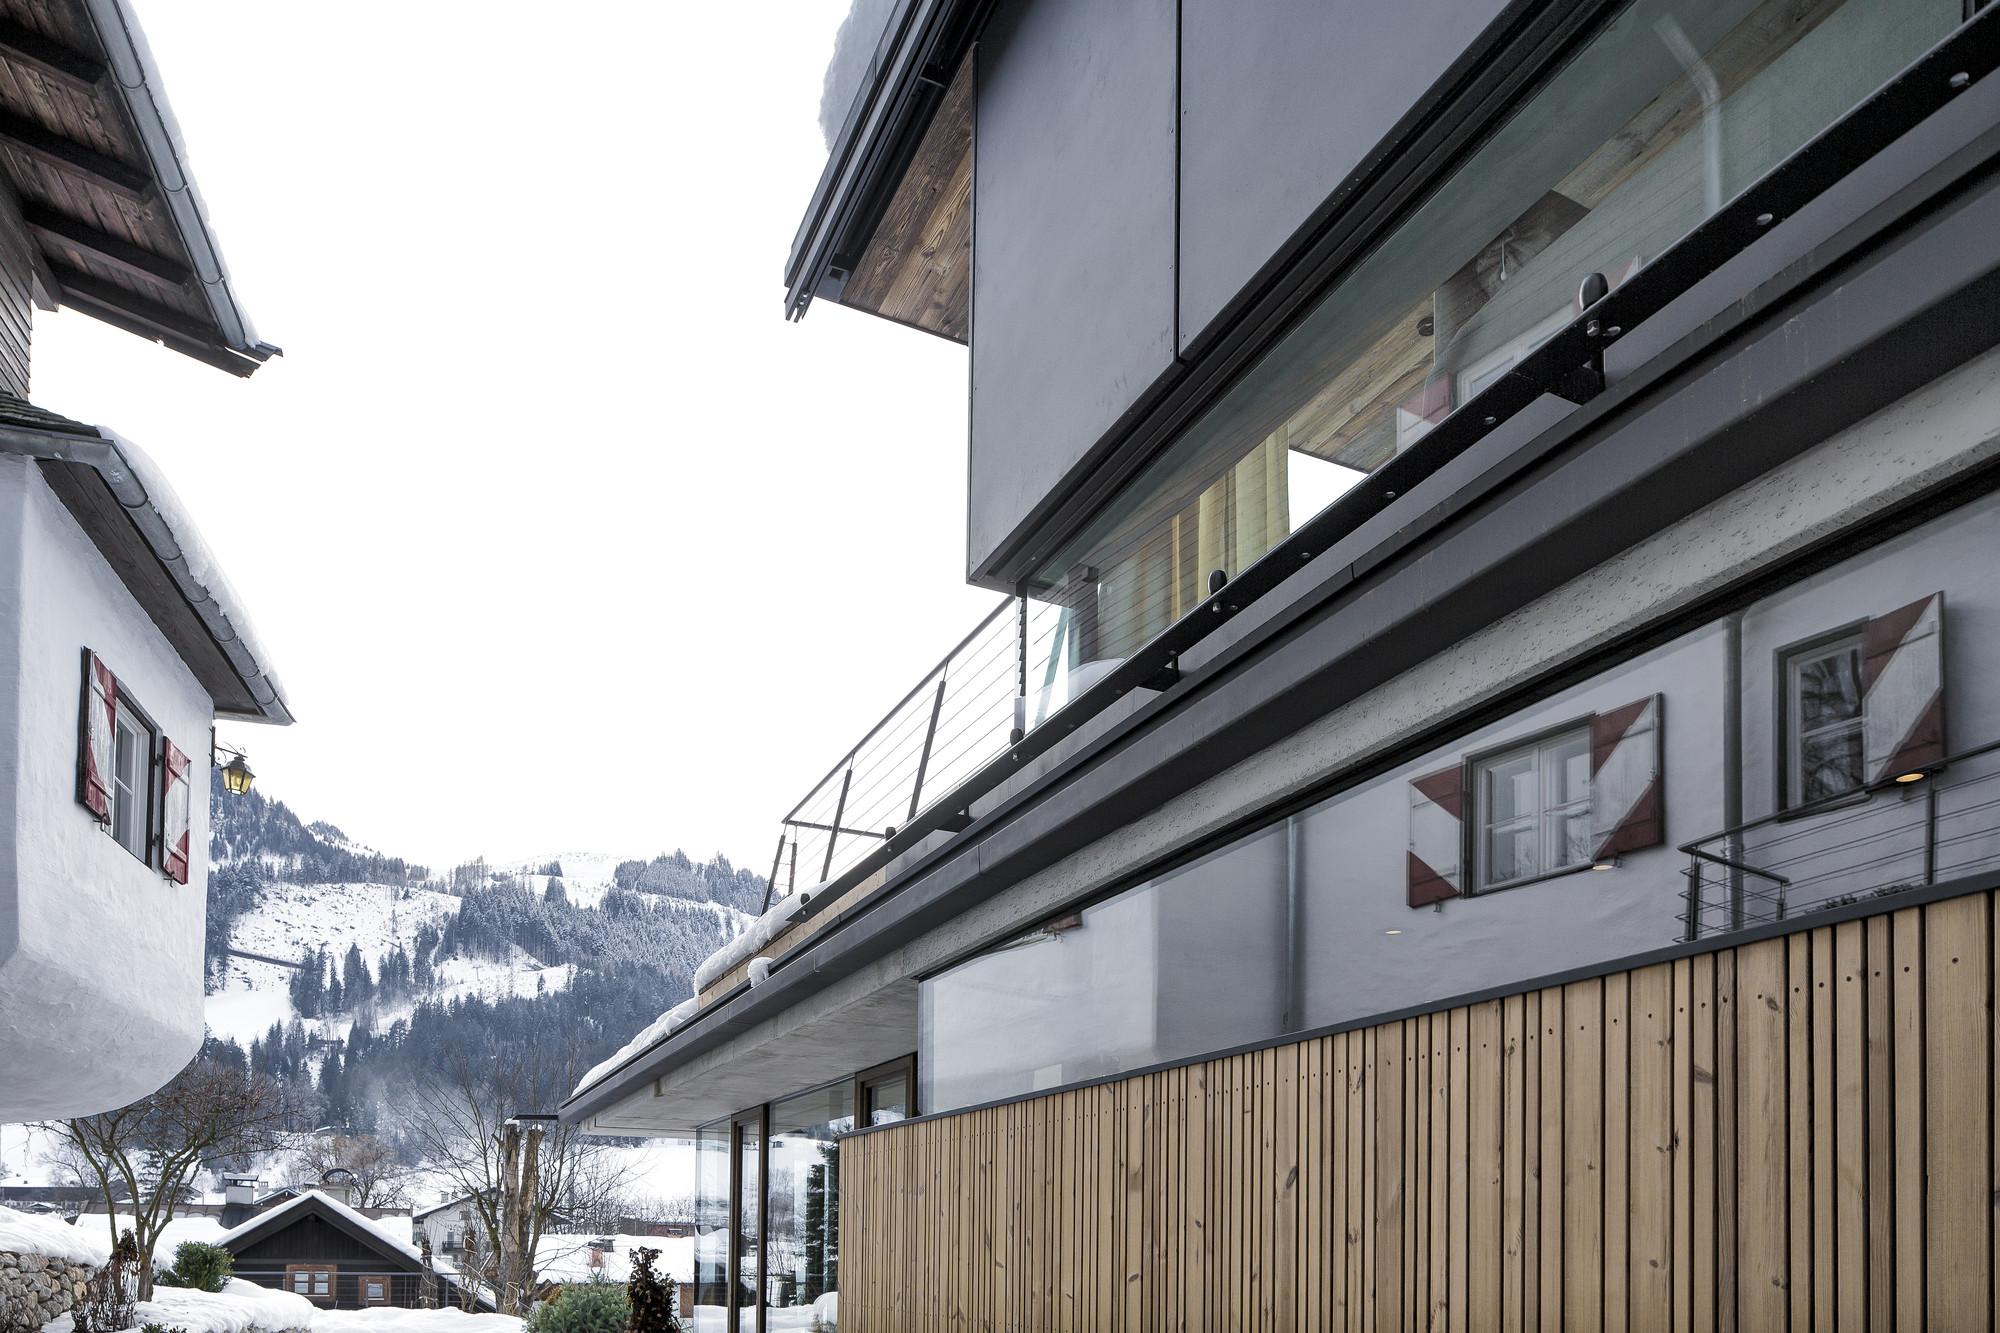 gallery of haus walde gogl architekten 9. Black Bedroom Furniture Sets. Home Design Ideas